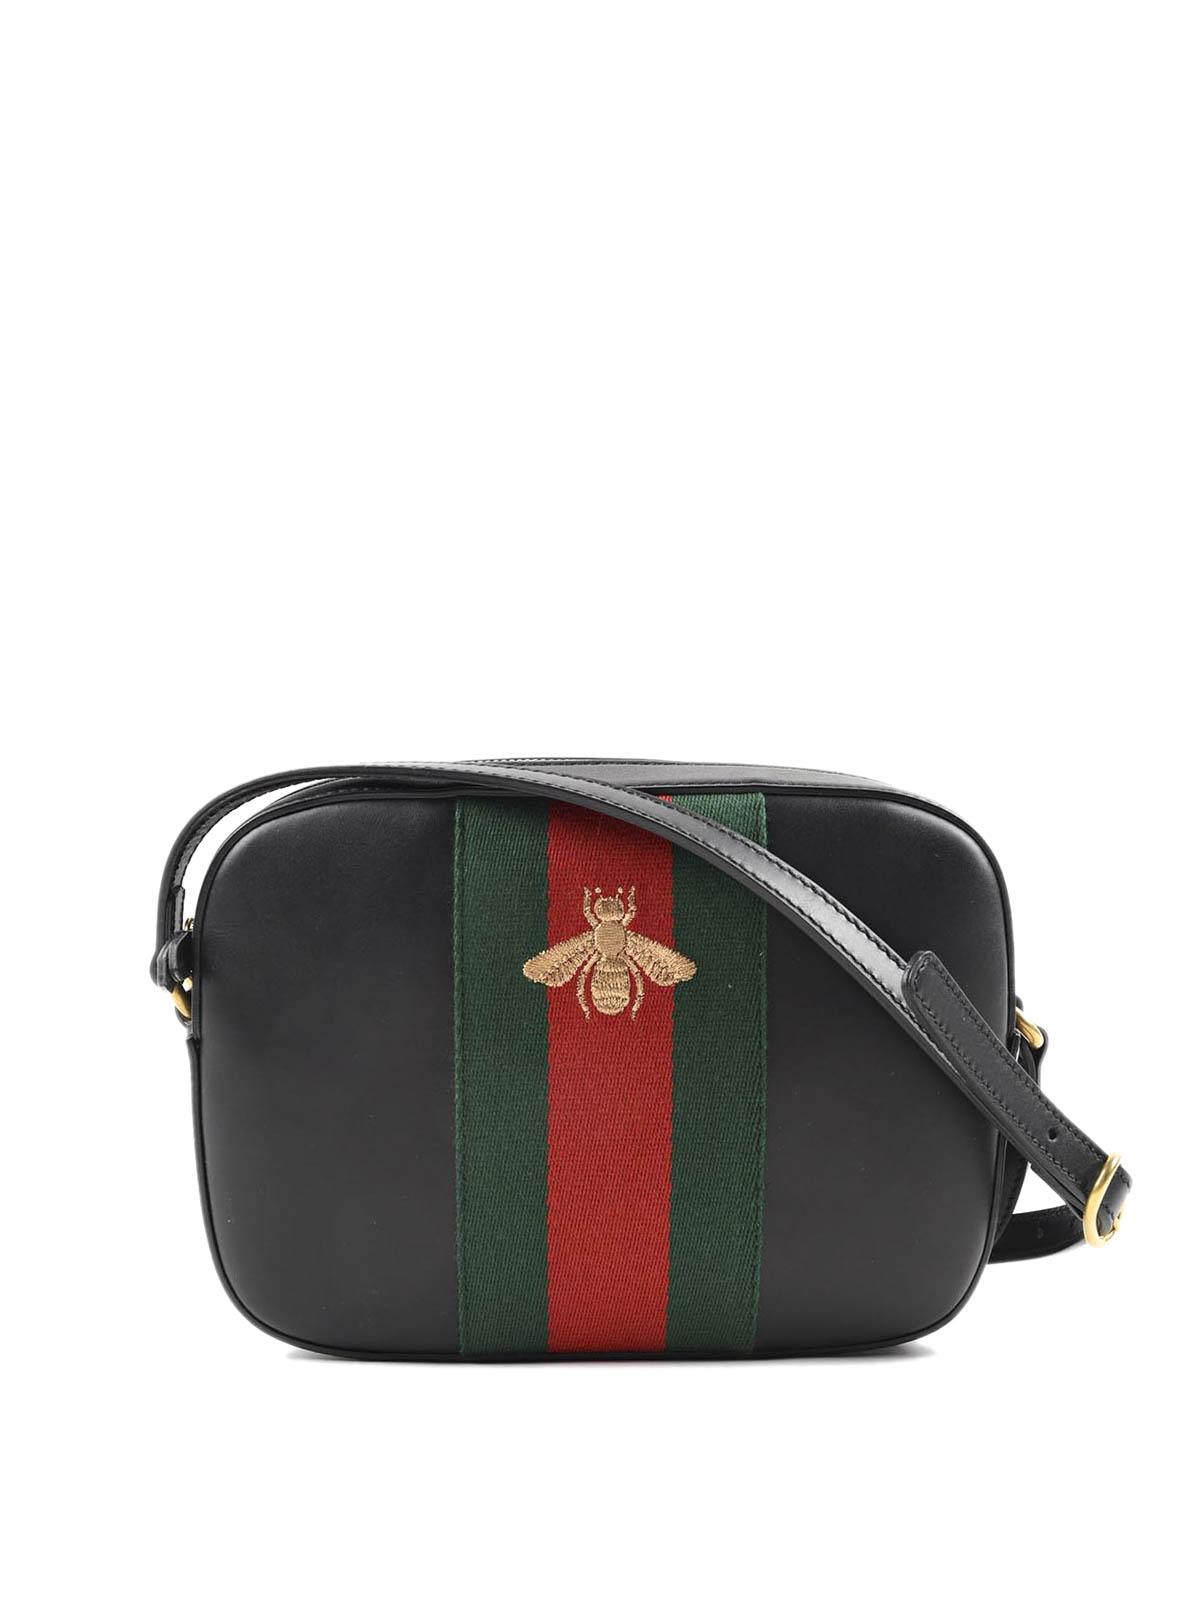 Gucci - Bolsa Bandolera Negra Para Mujer - Bolsas bandoleras ... 5933842b529